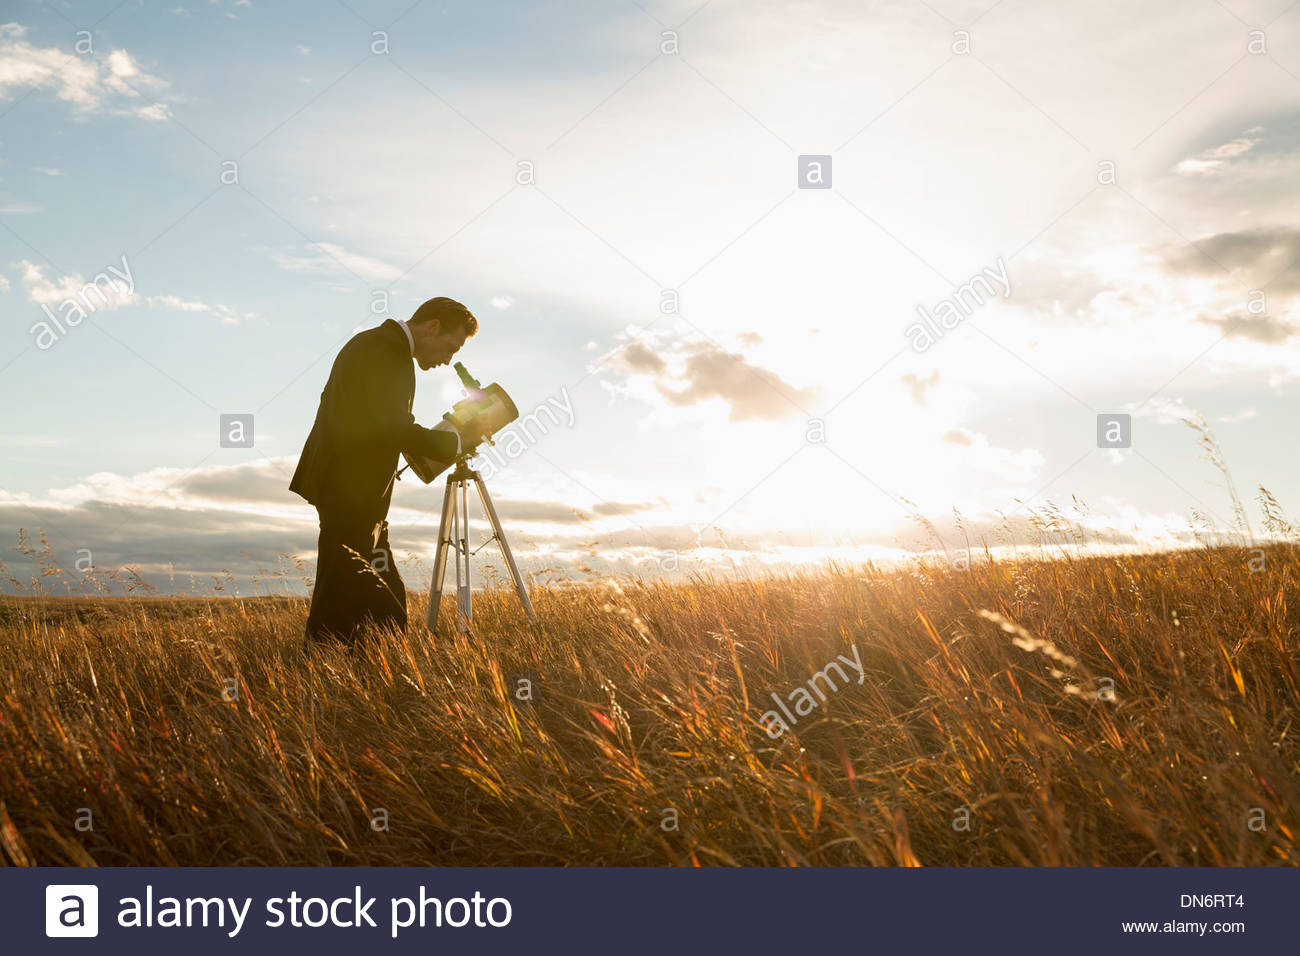 Businessman using telescope on field - Stock Image